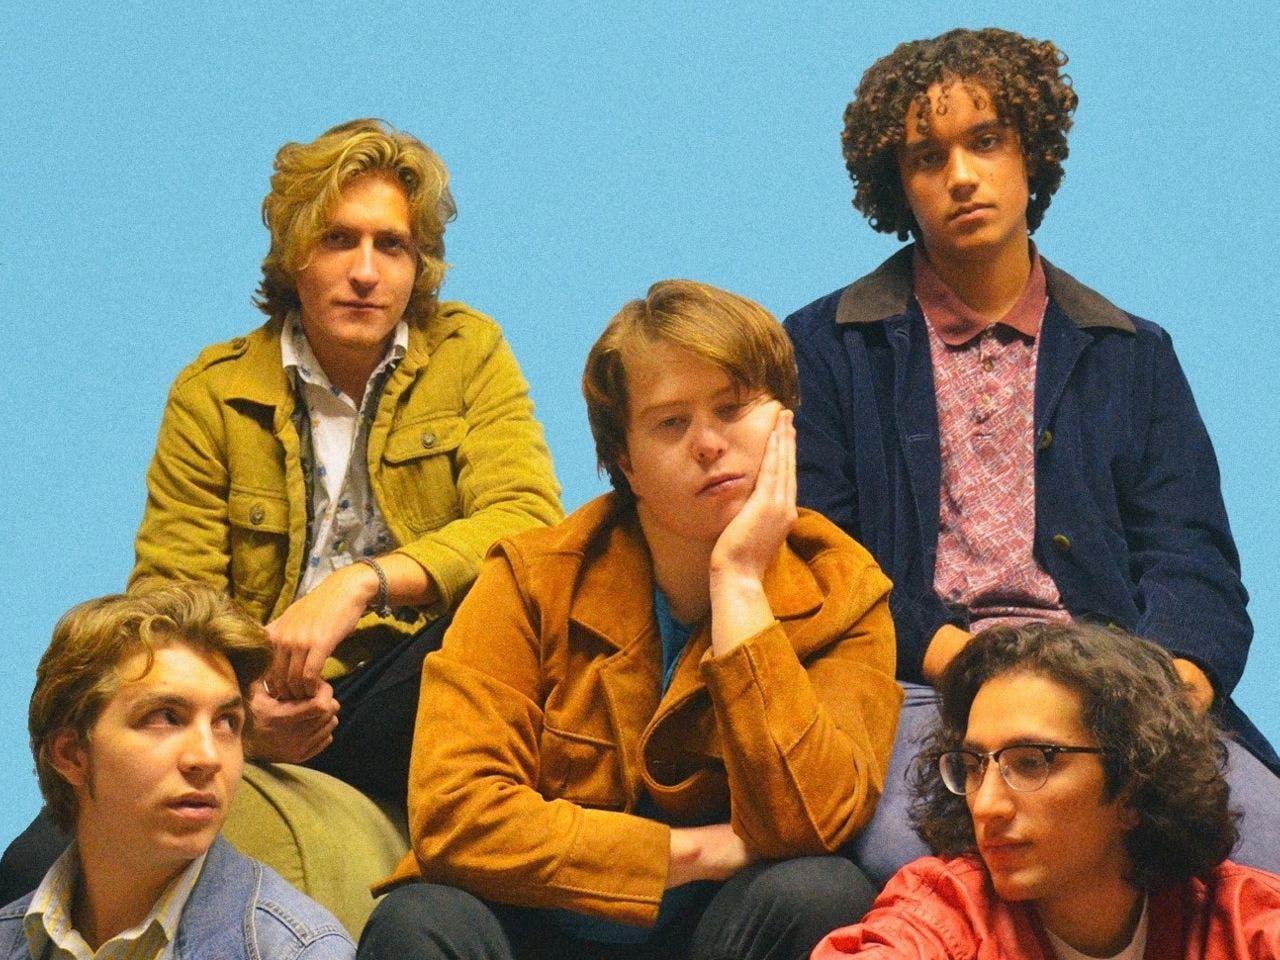 The Grinns at Songbyrd Vinyl Lounge